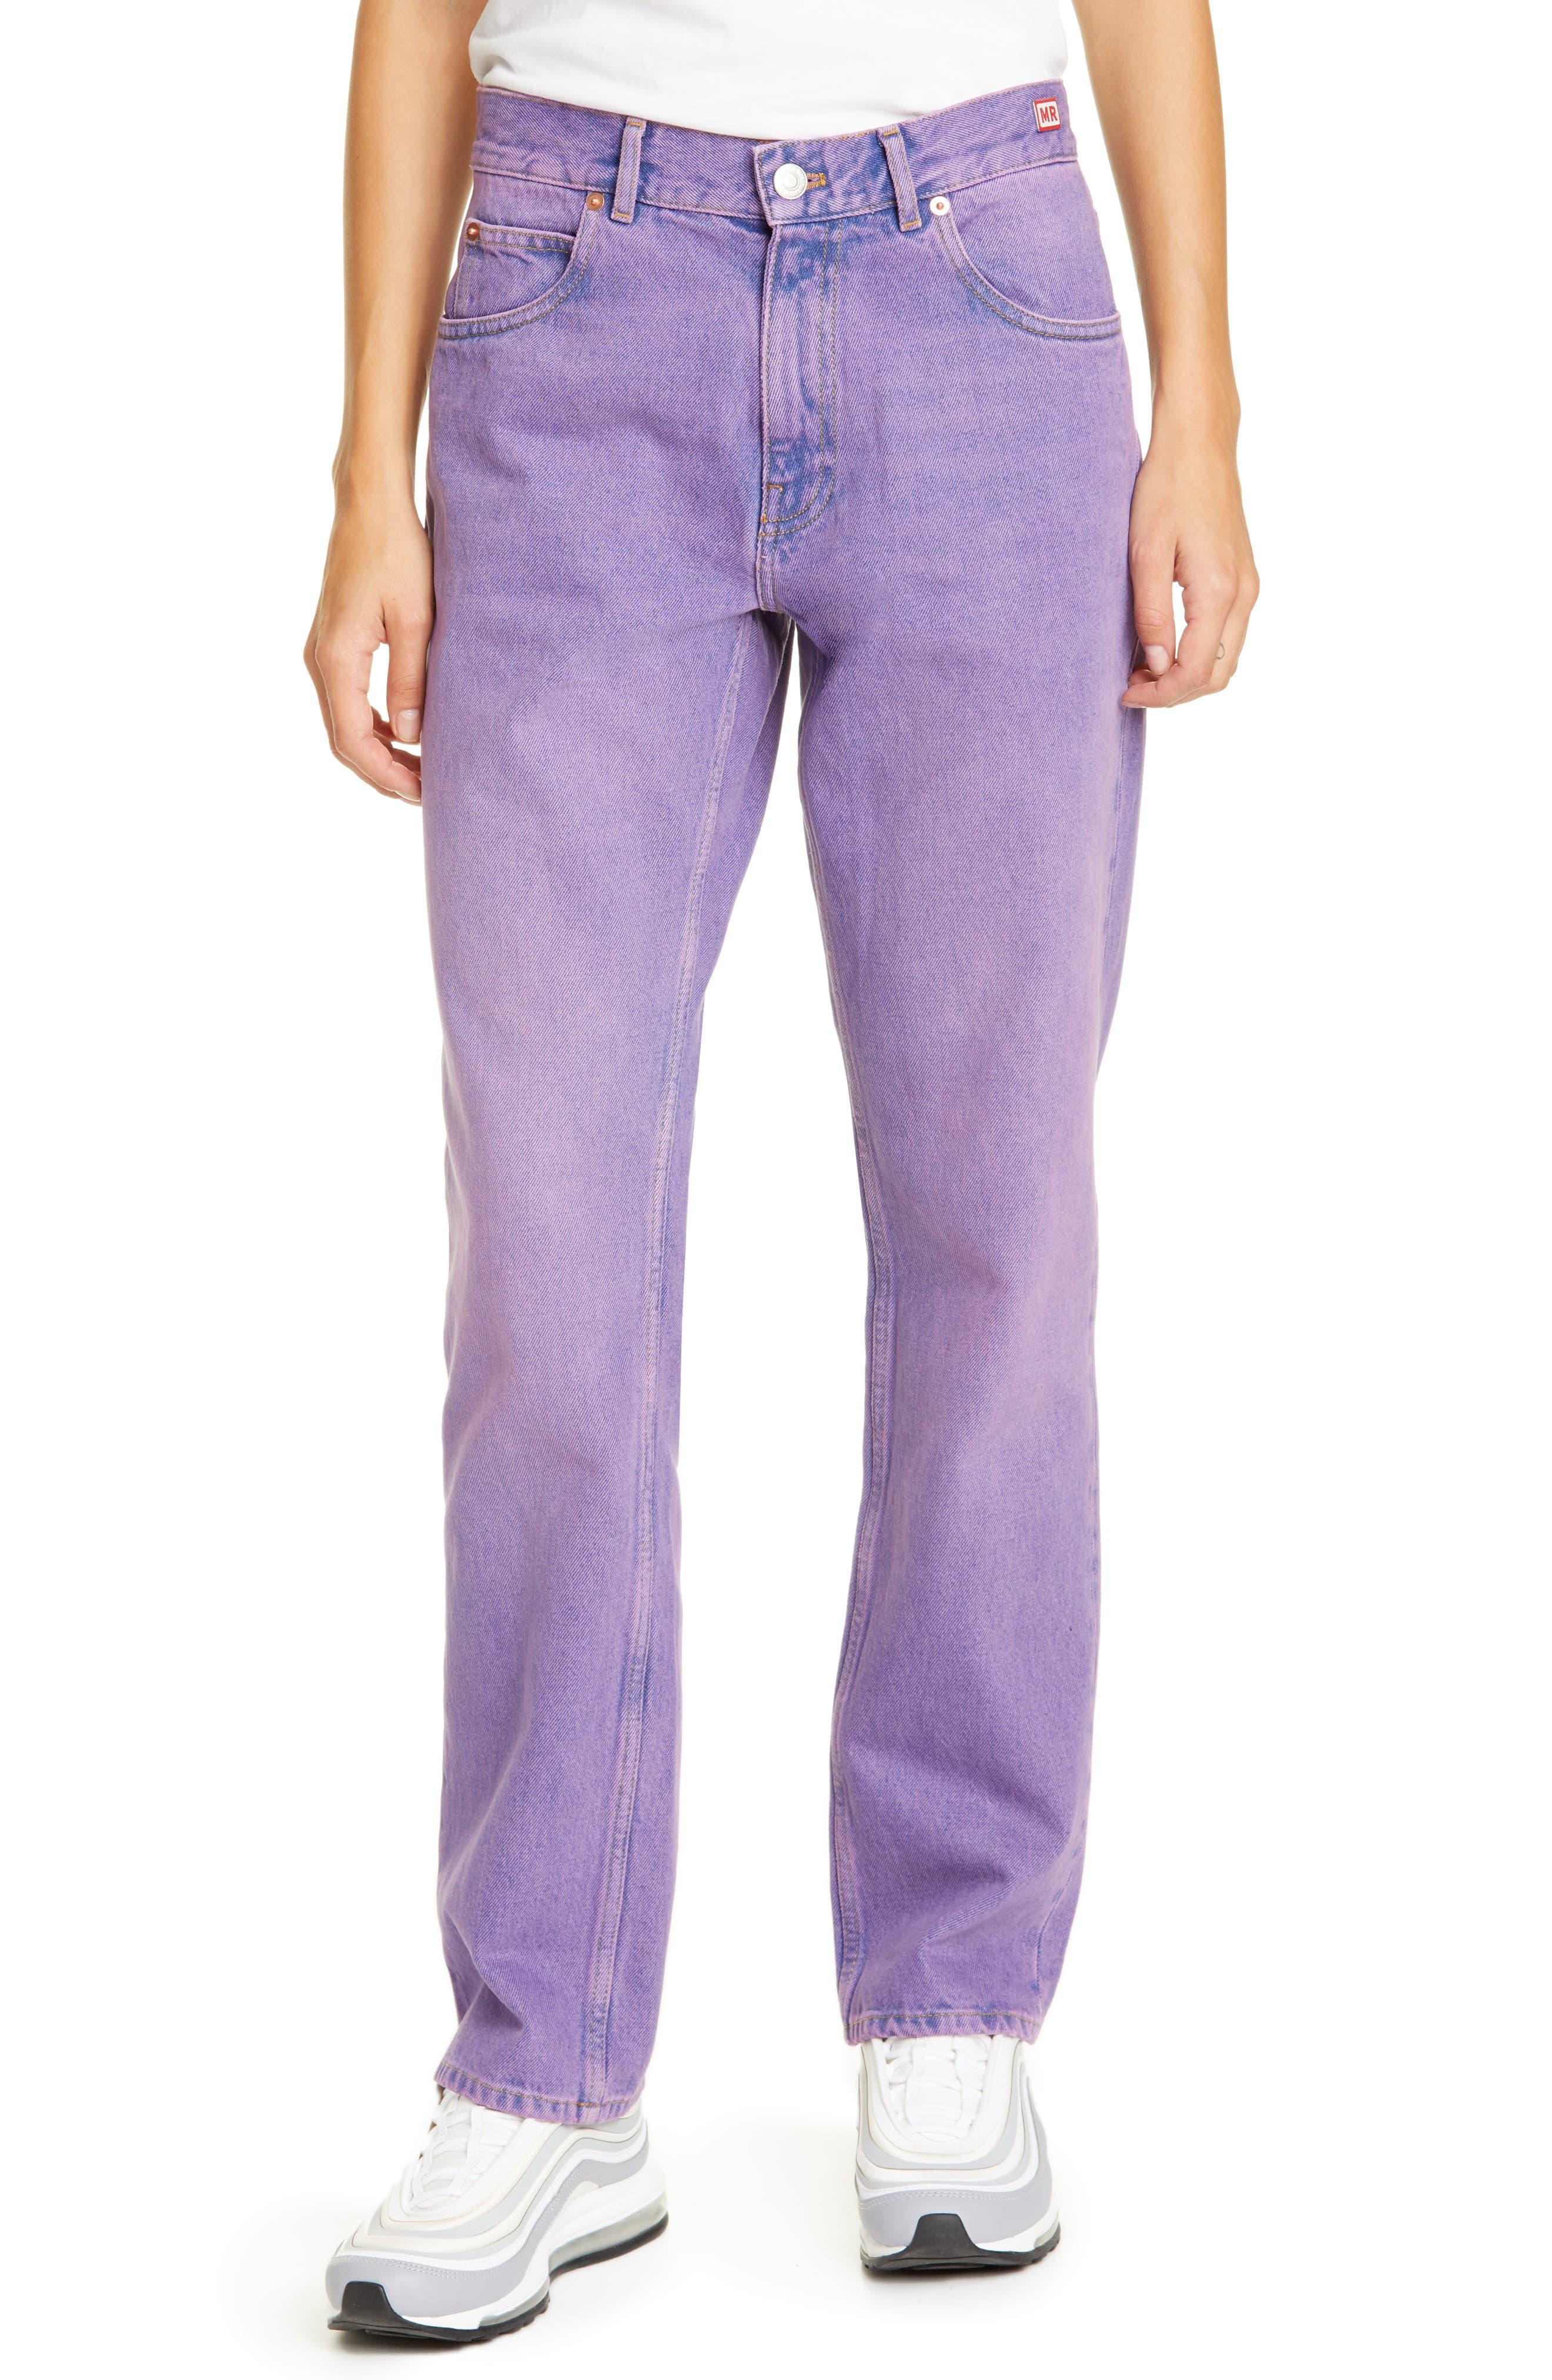 Martine Rose Jeans Straight Leg Jeans